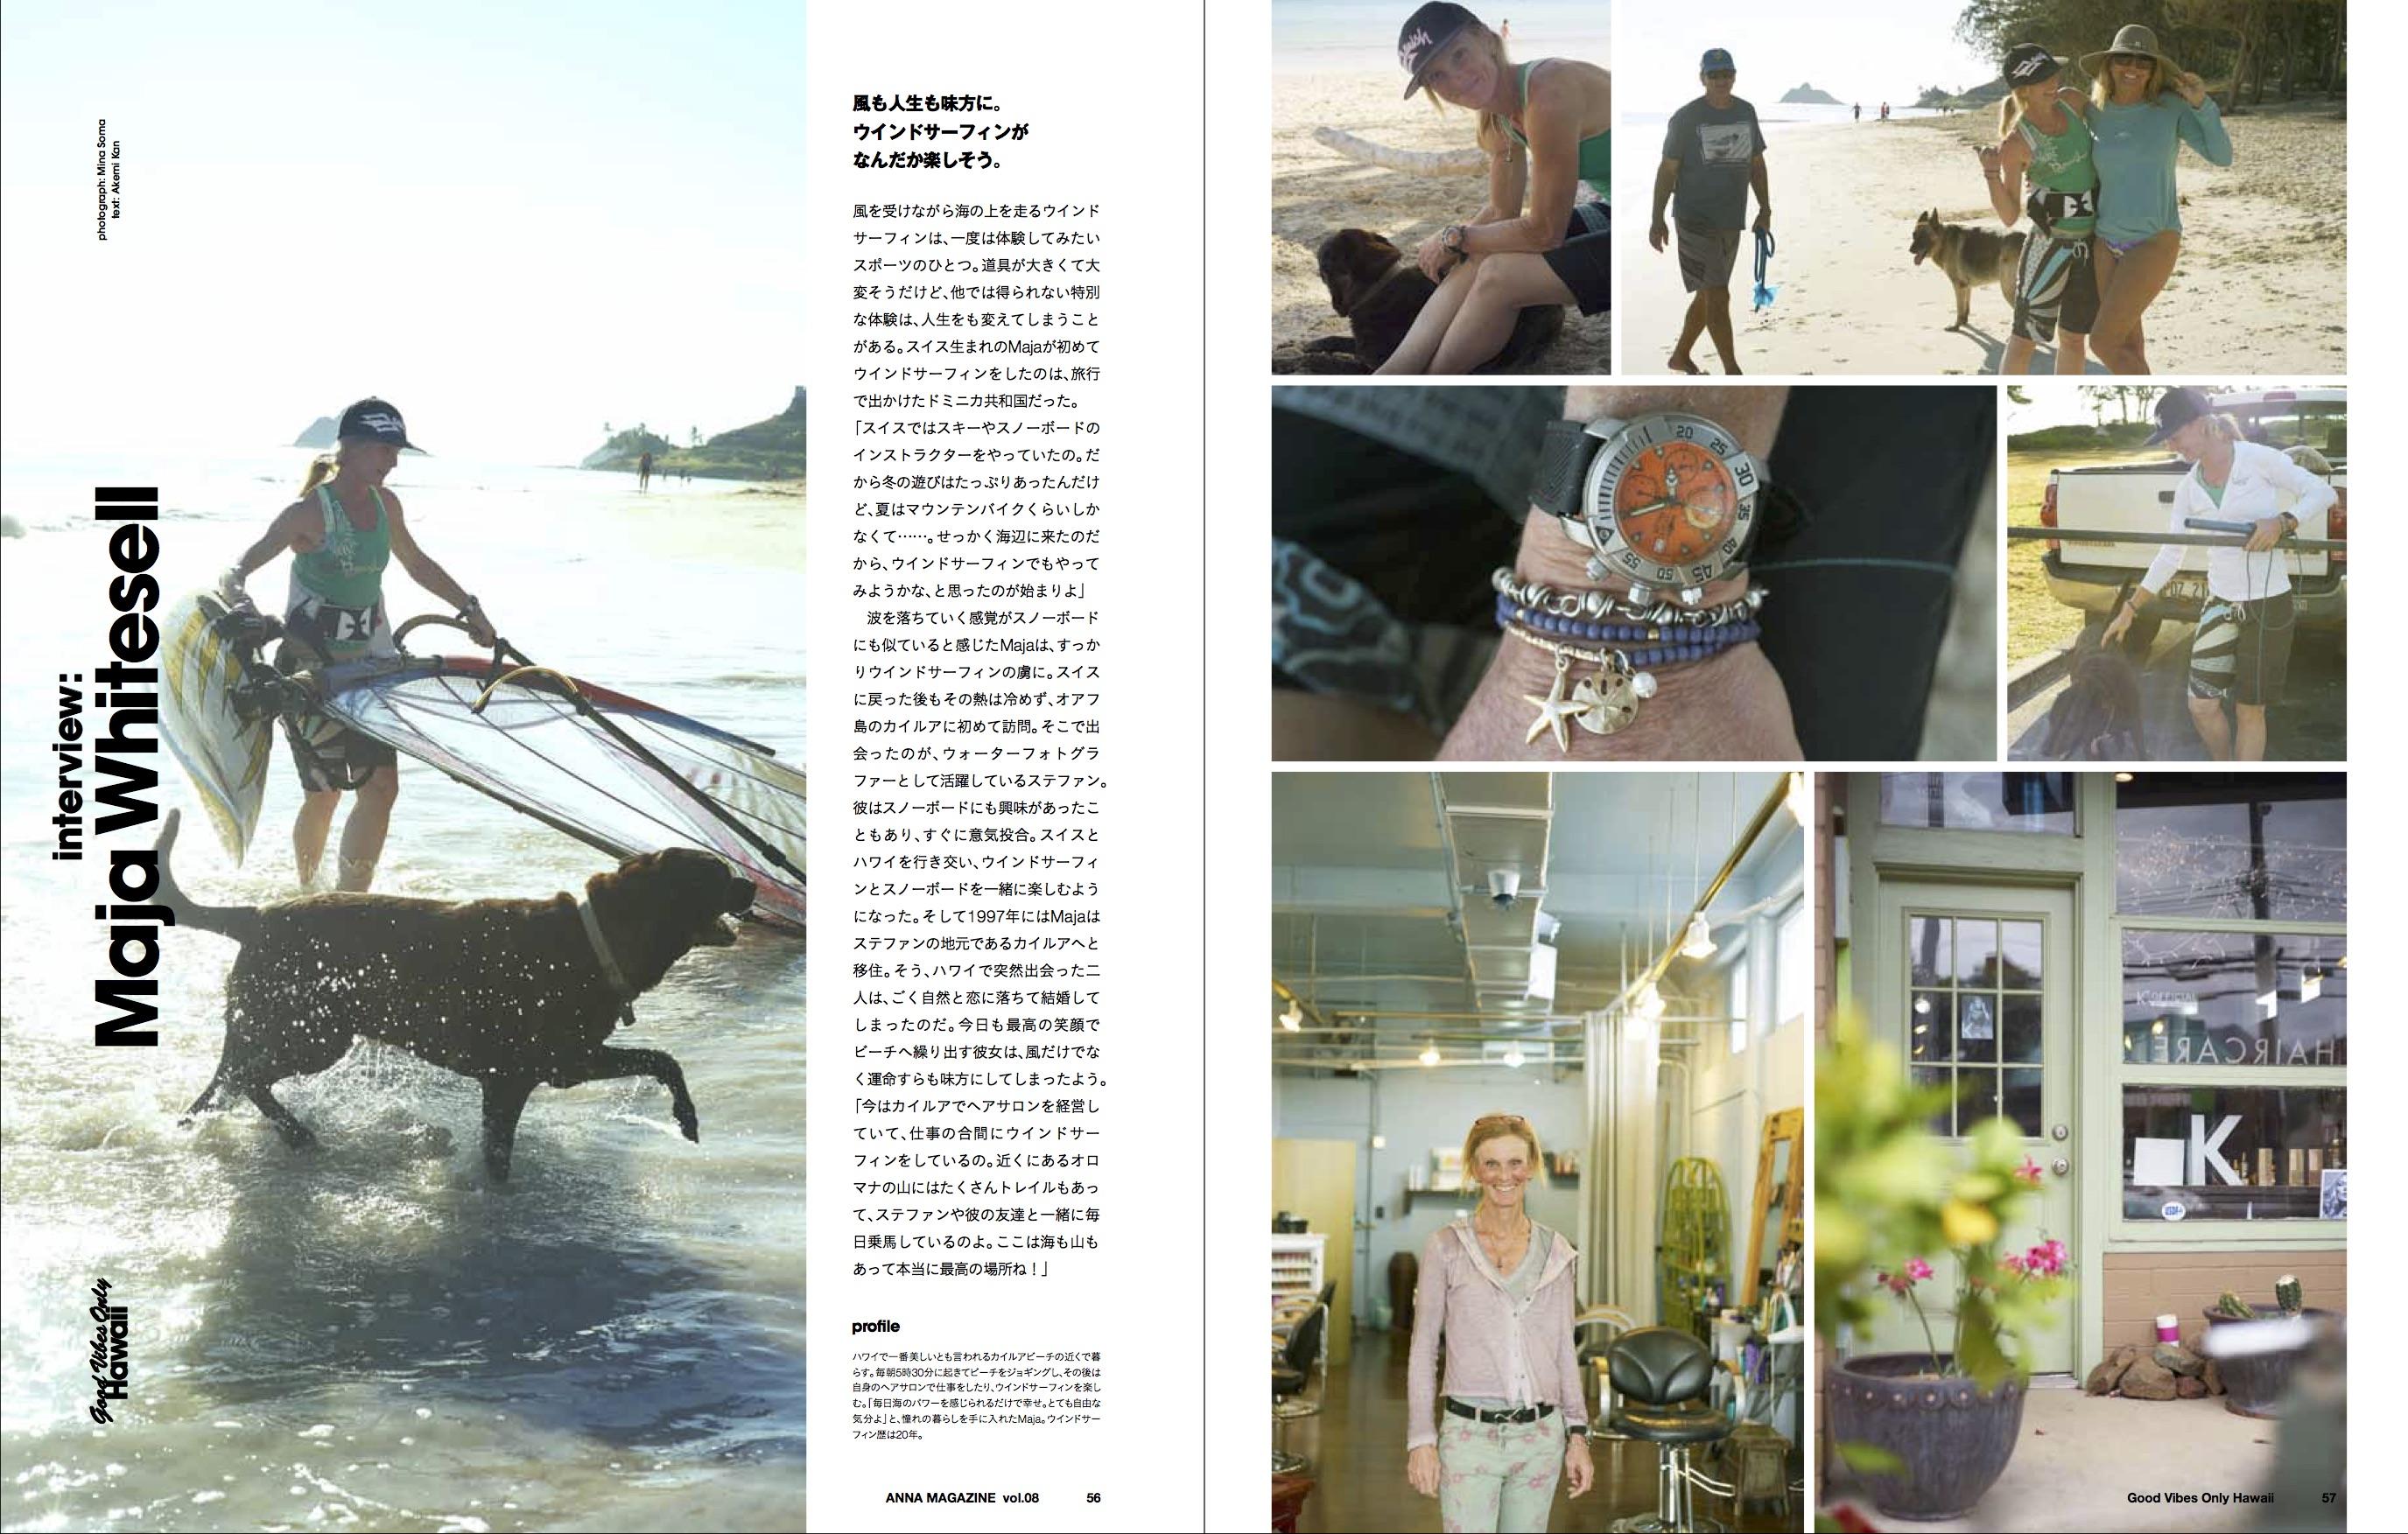 anna magazine vol.8 P27